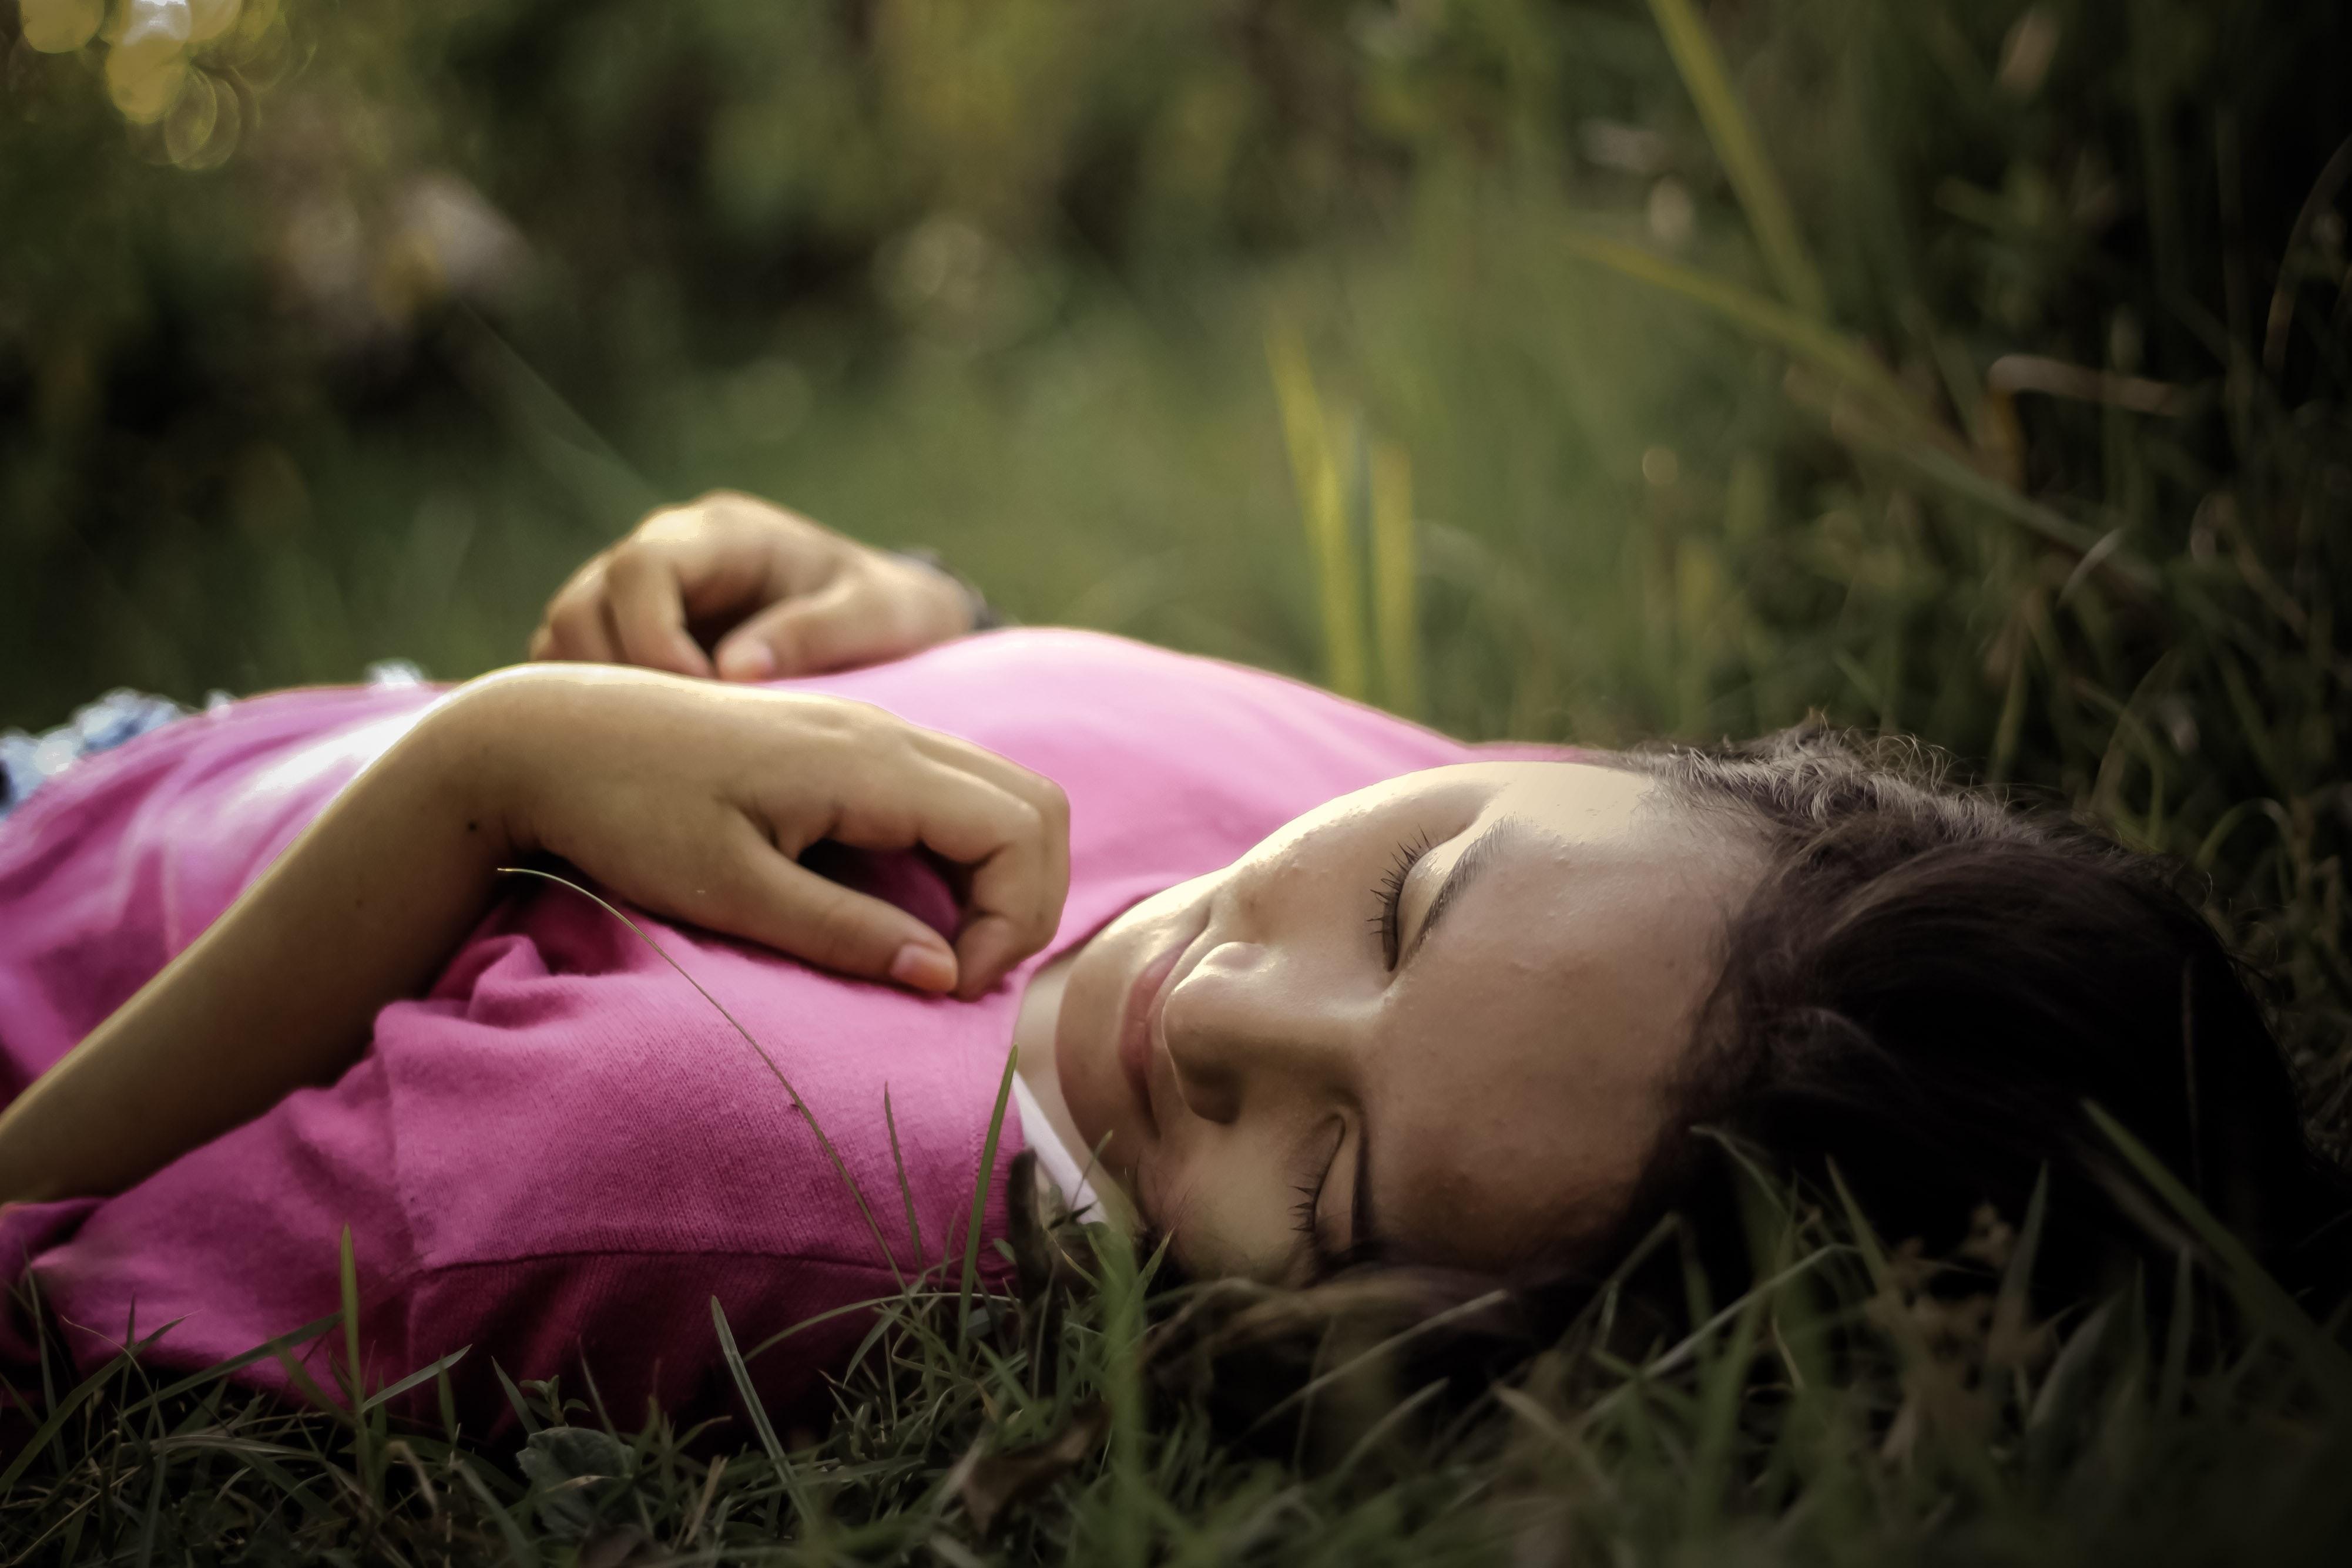 Femme -qui-dort-dans-l-herbe